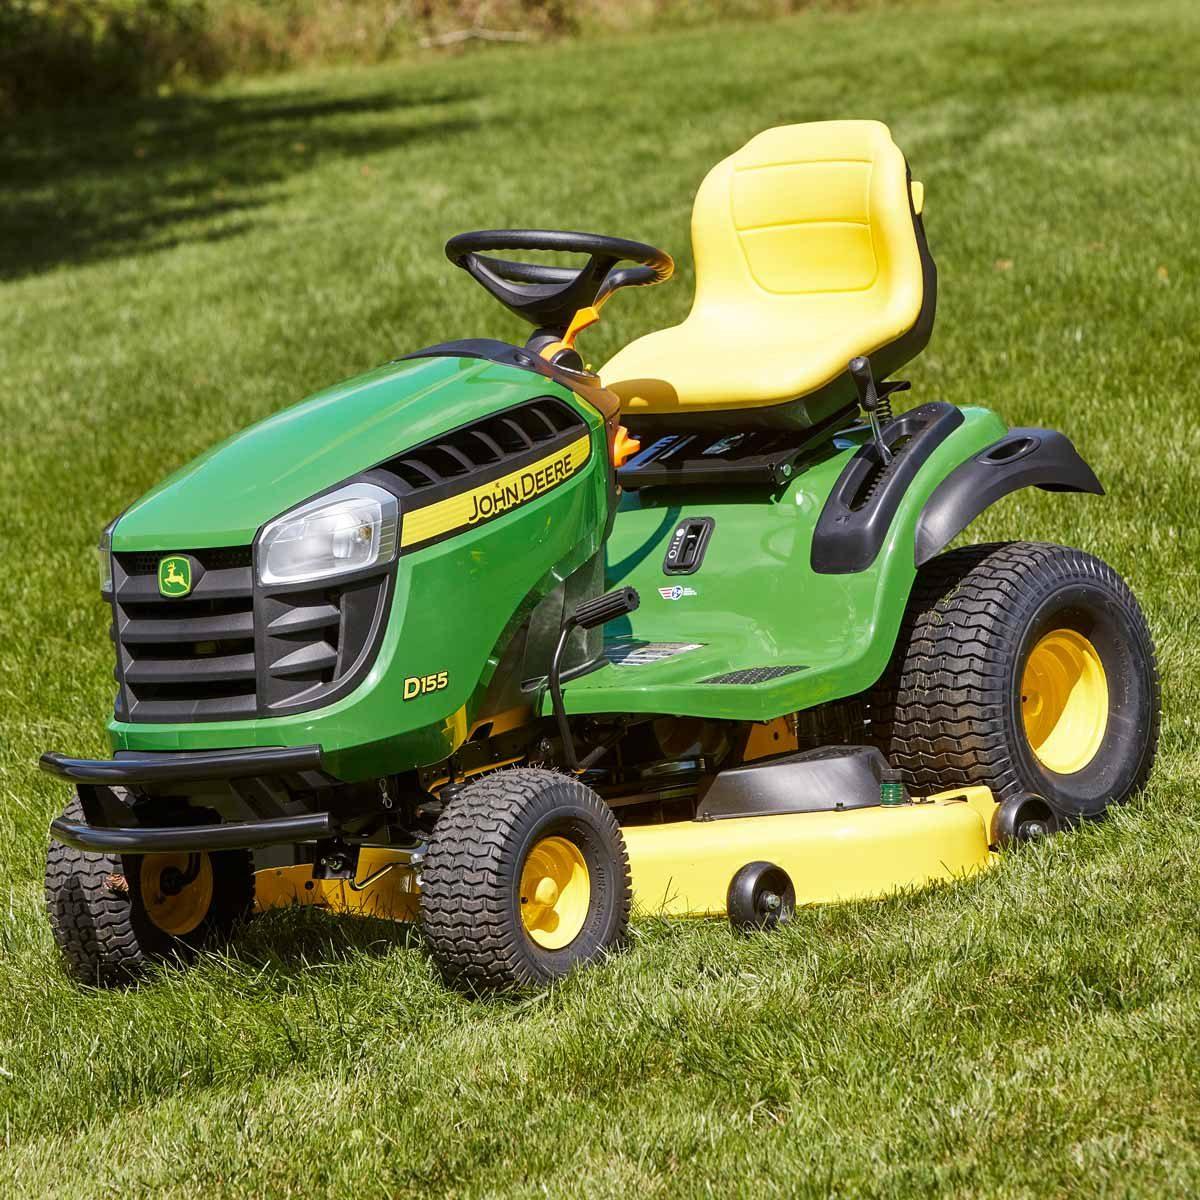 John Deere D155 lawn tractor